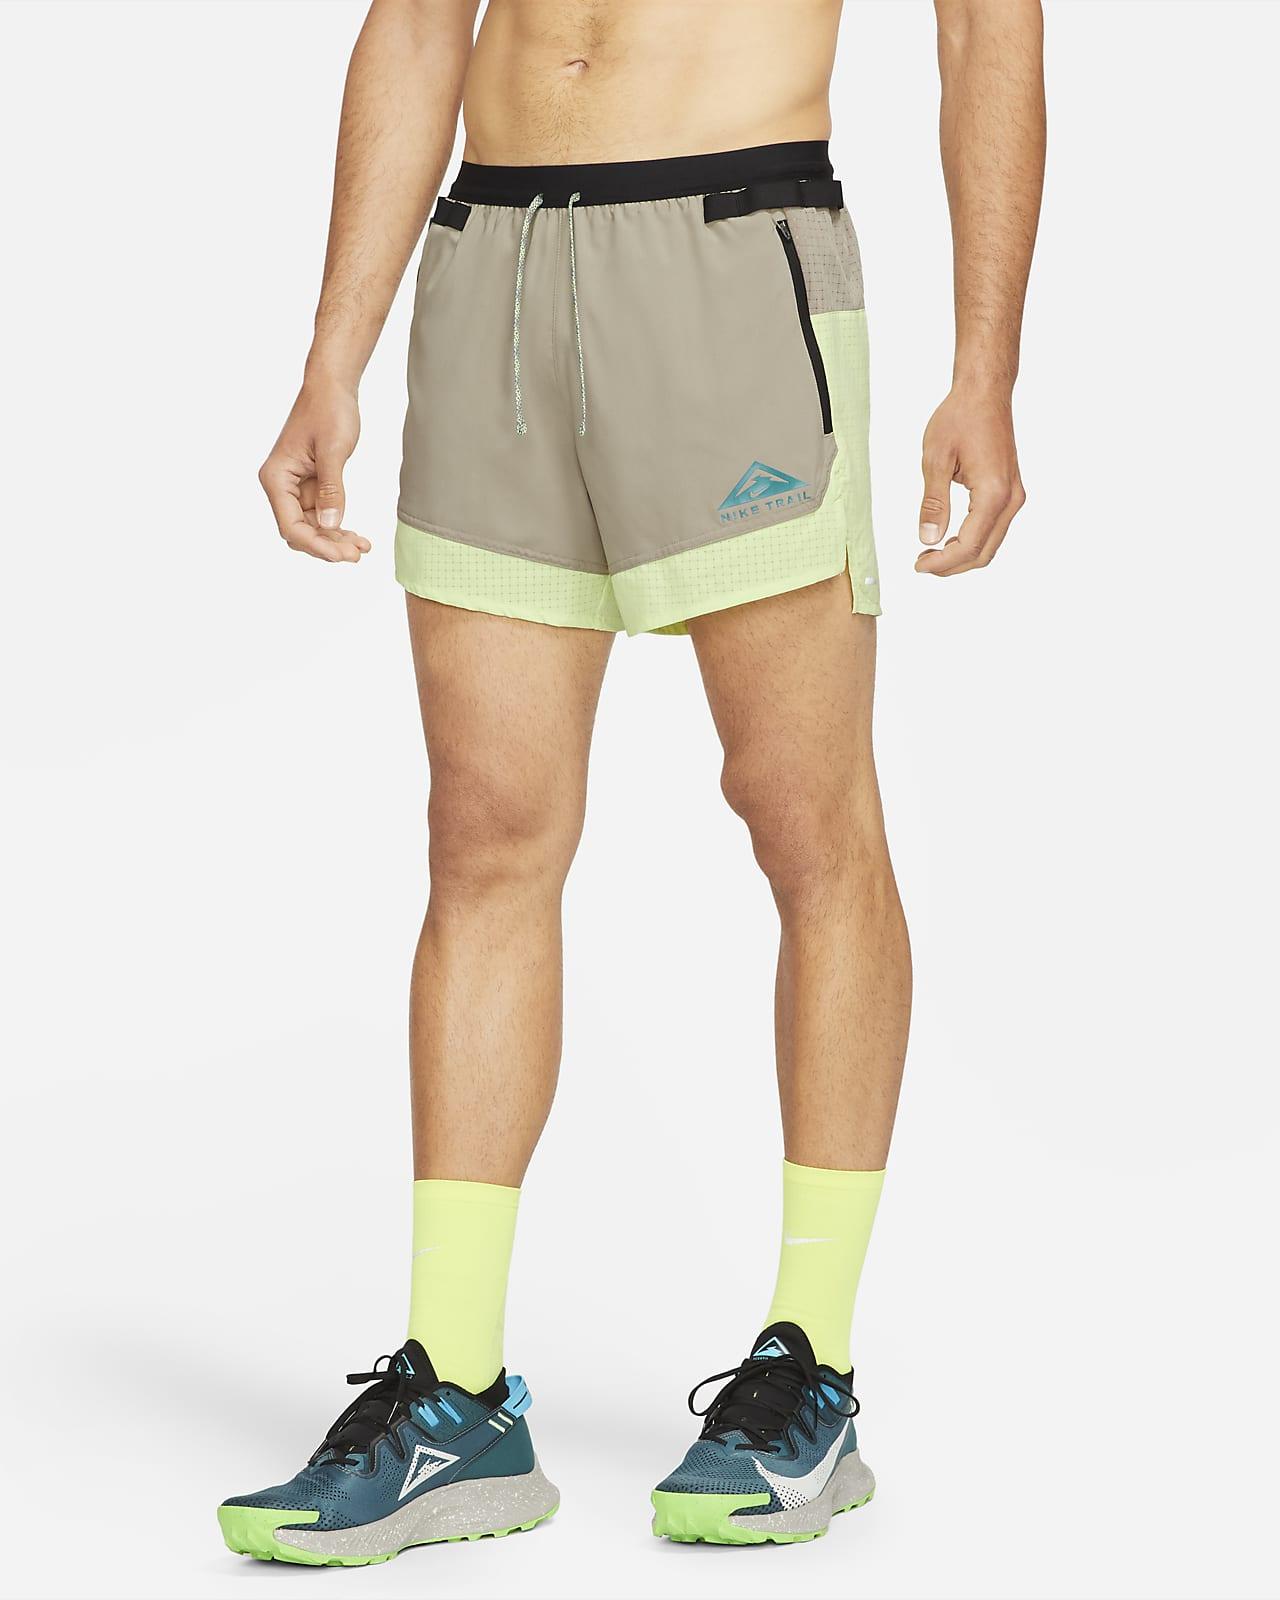 Nike Dri-FIT Flex Stride Men's Trail Shorts